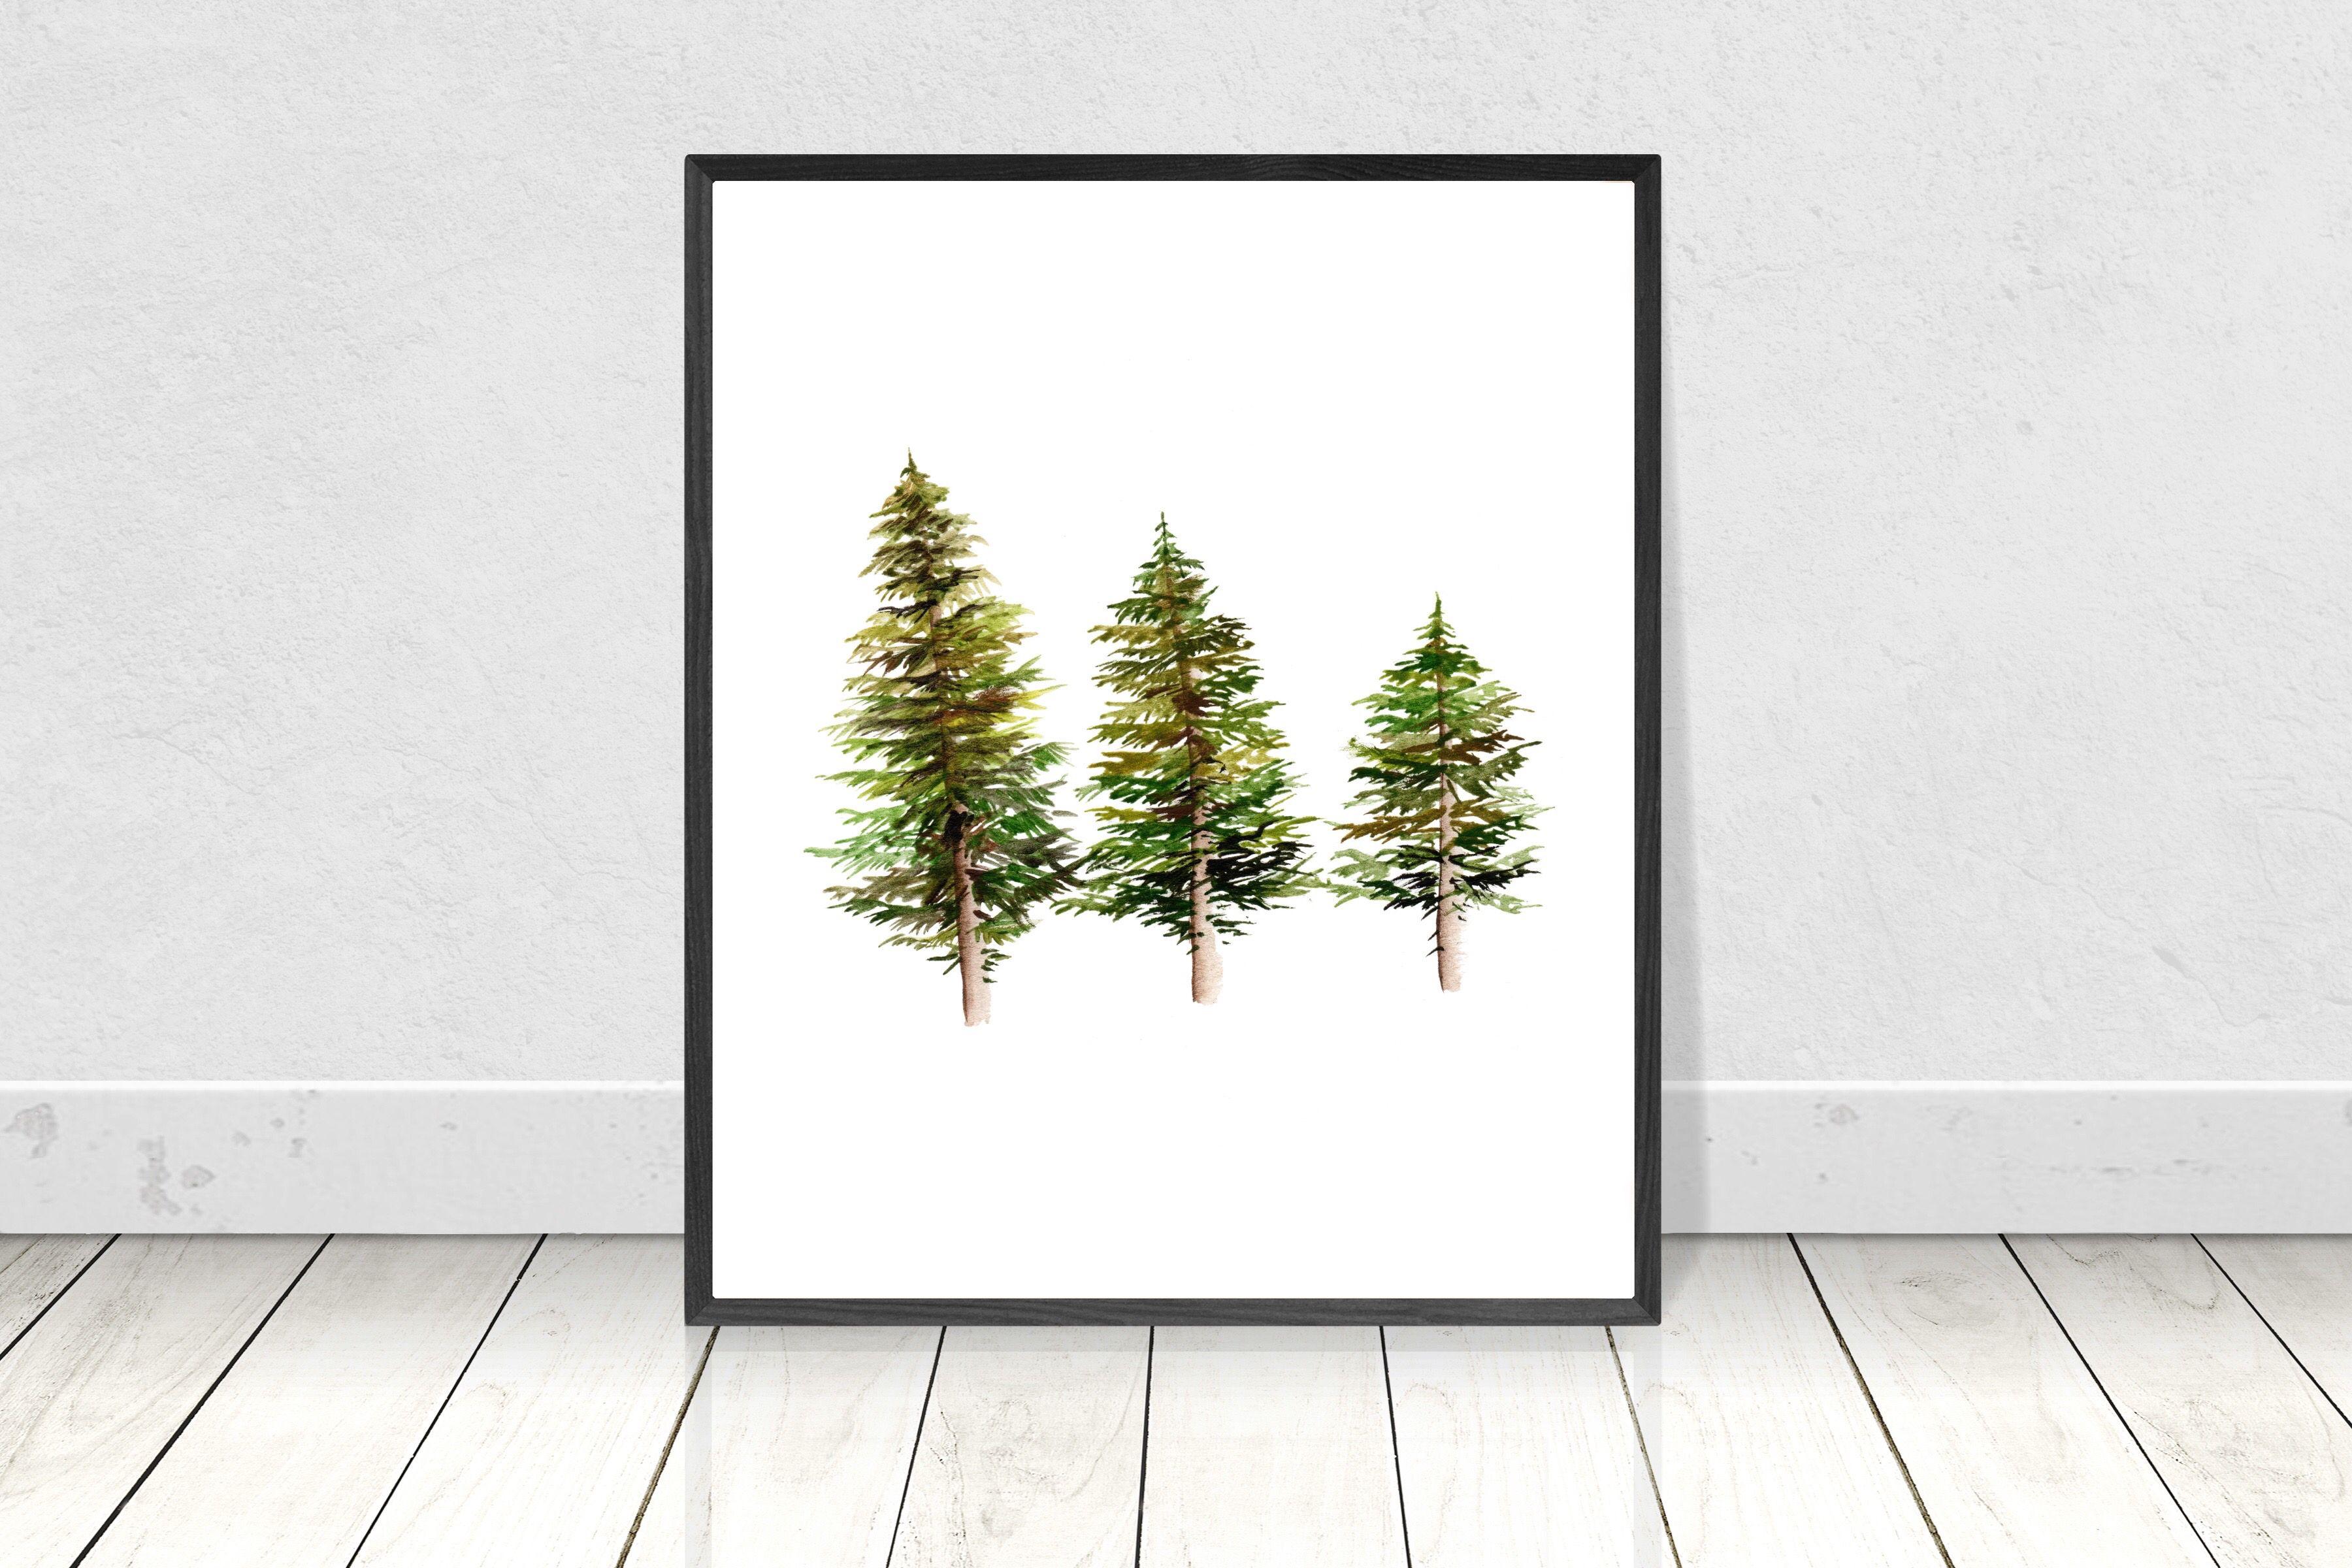 Scandinavian Pine Tree Poster Pine Tree Painting Tree Watercolor Painting Scandinavian Paintings